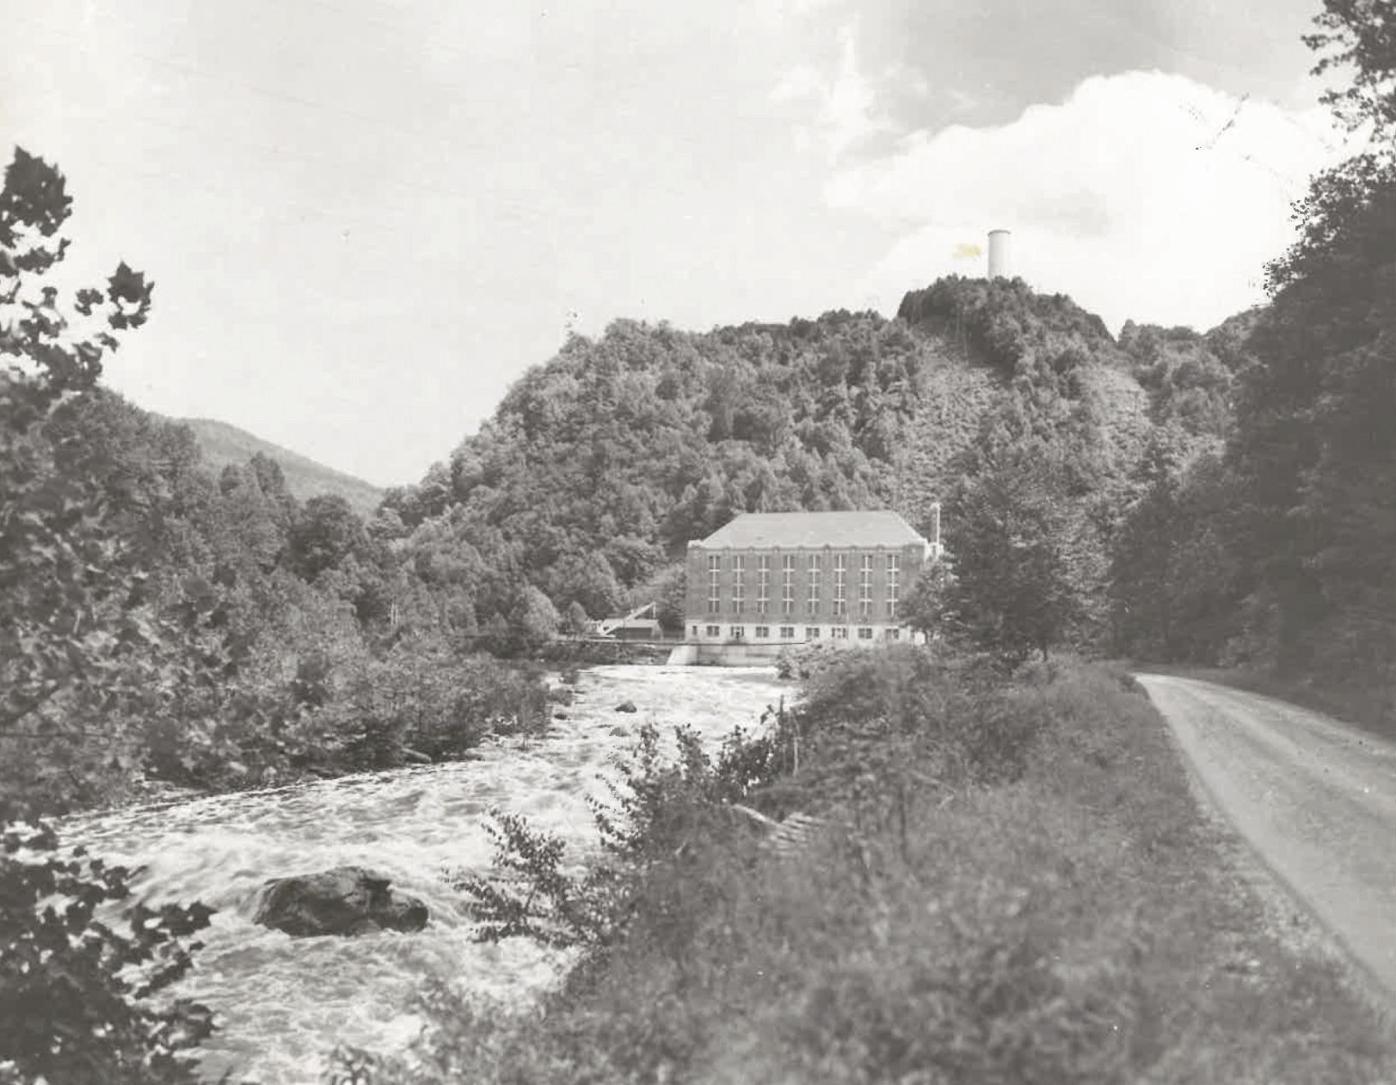 Walters Hydro plant